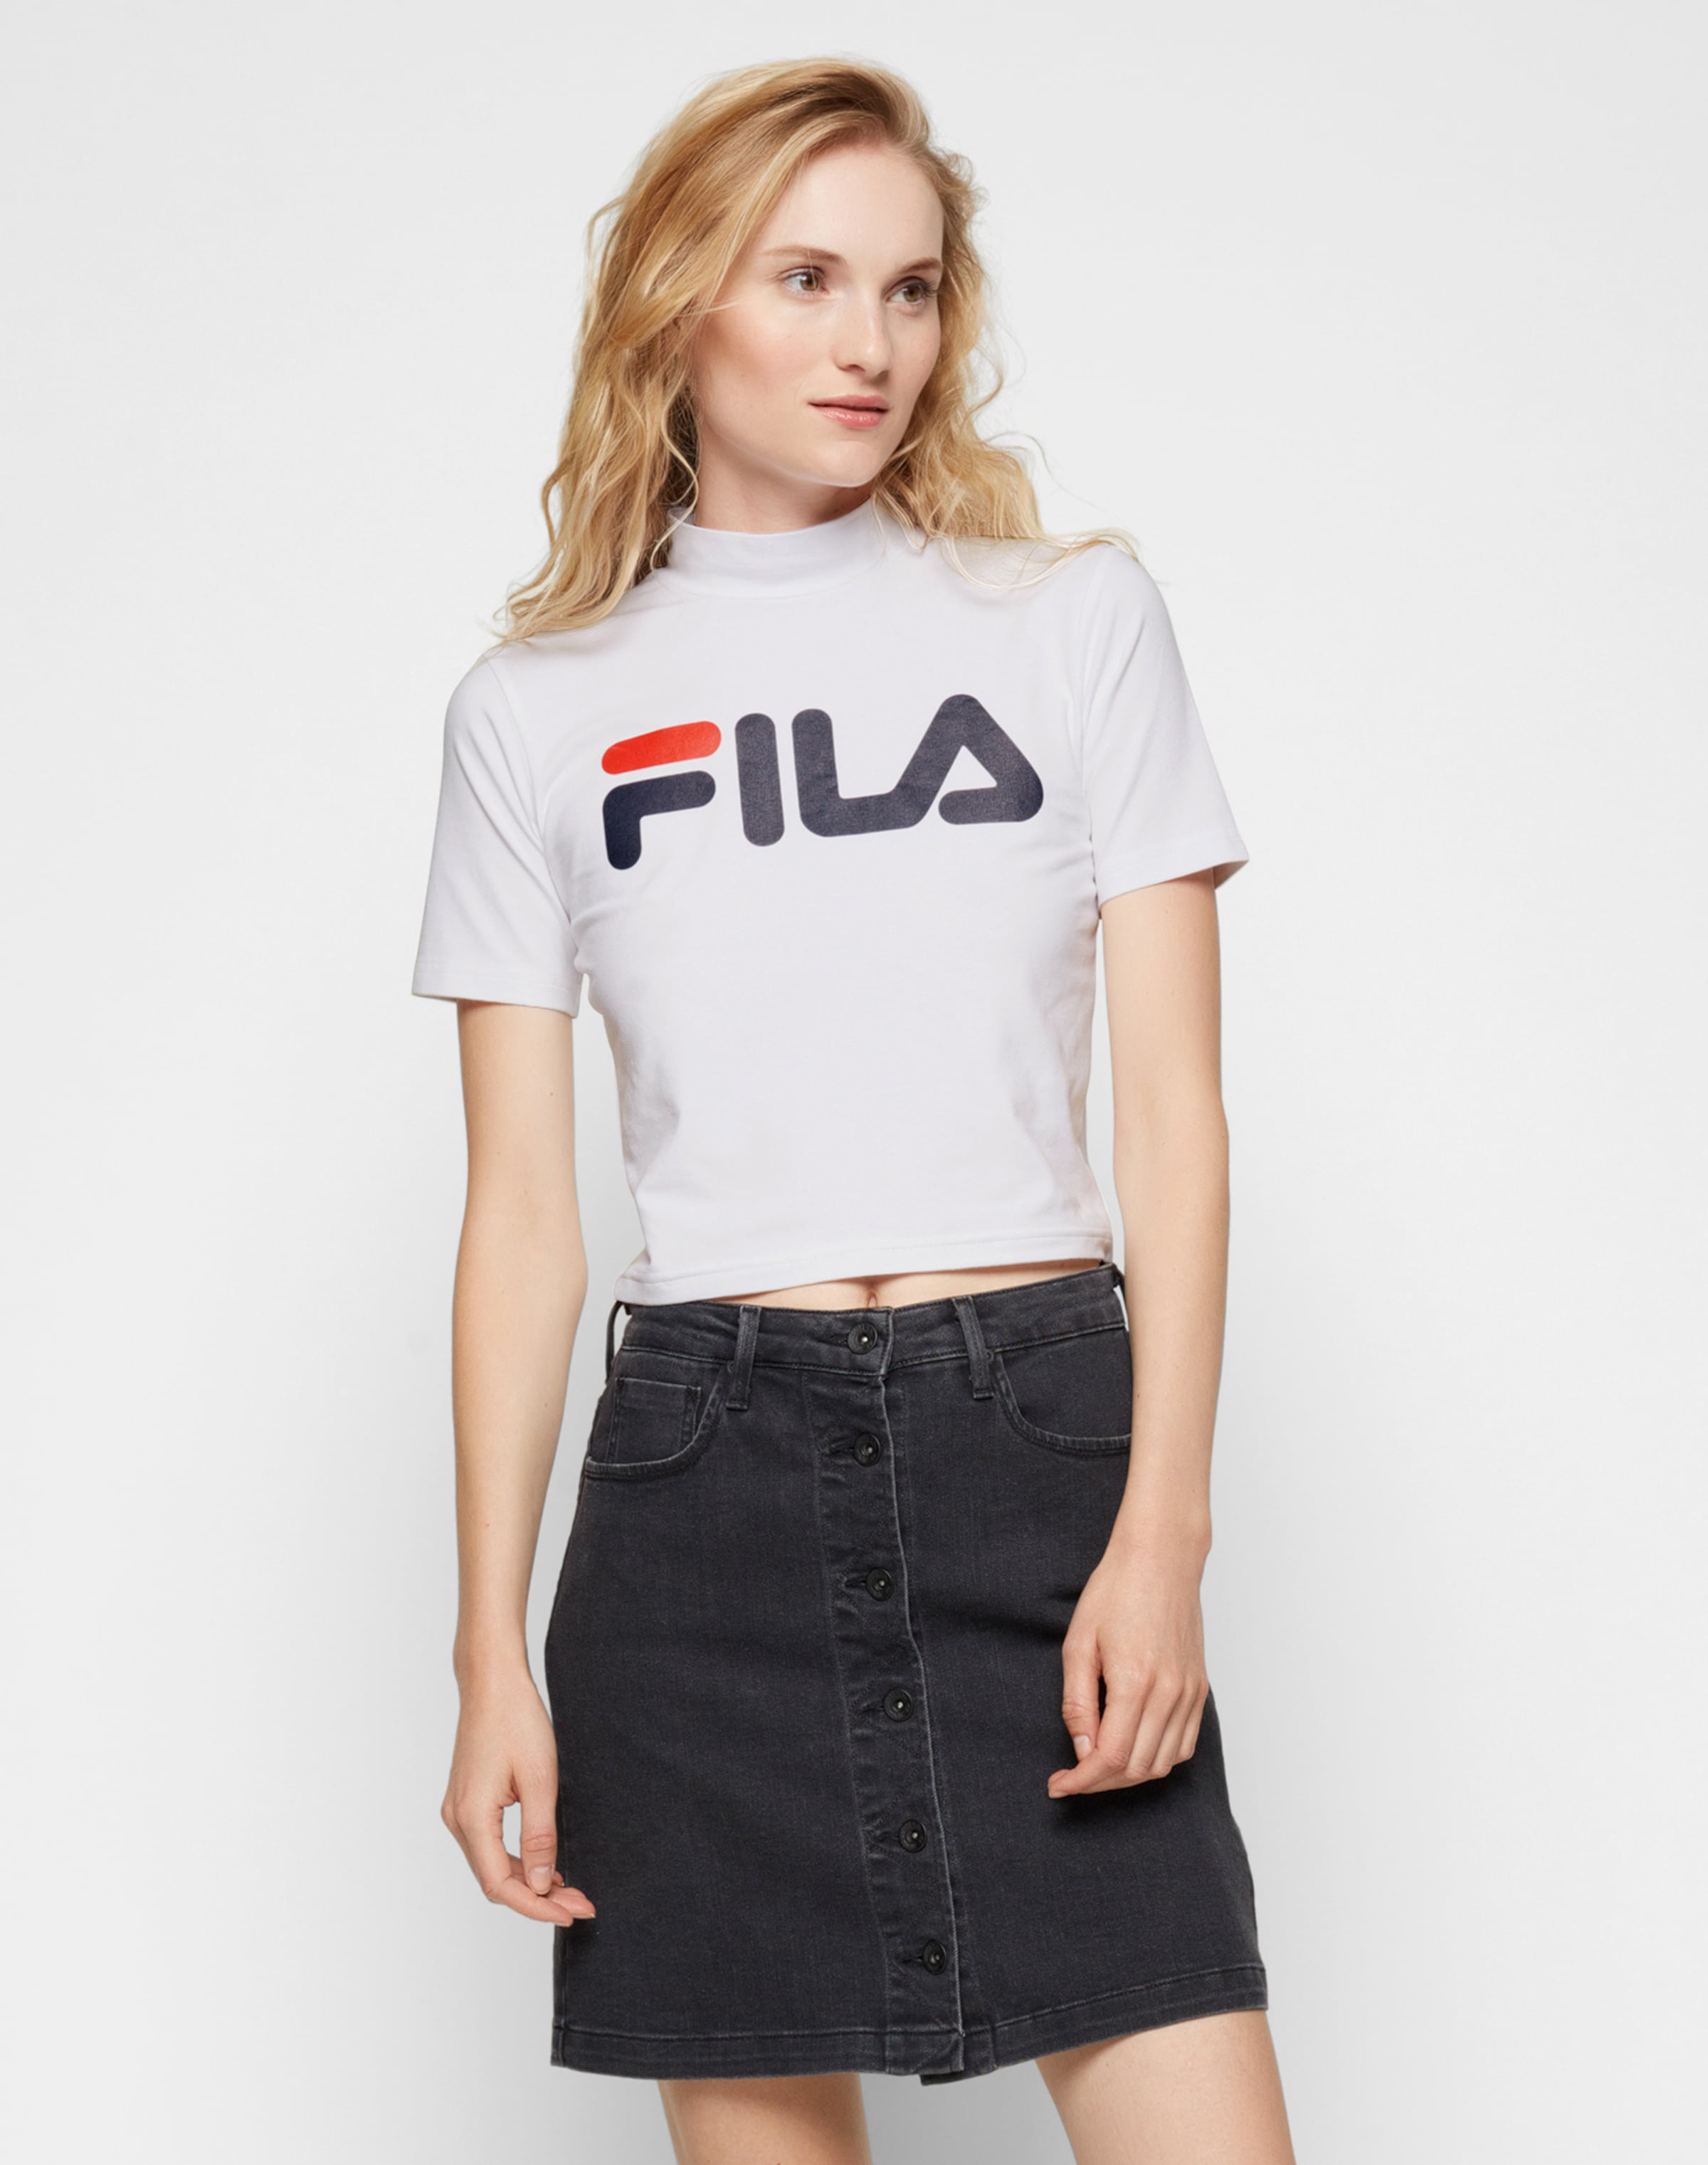 Blanc Fila En shirt RougeNoir T k0OP8wn